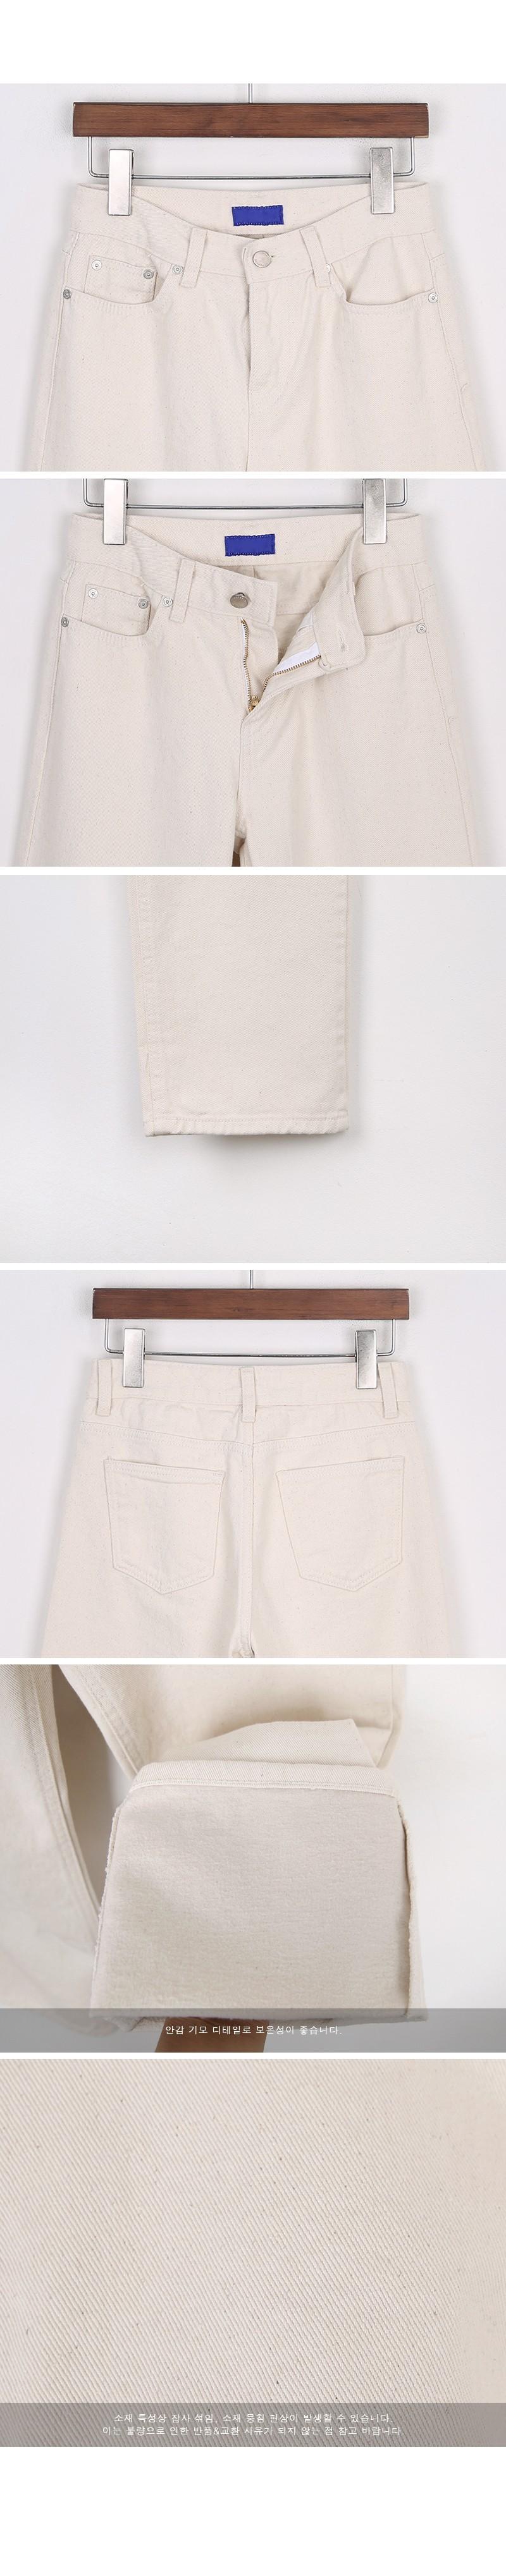 Wide Cream Pants